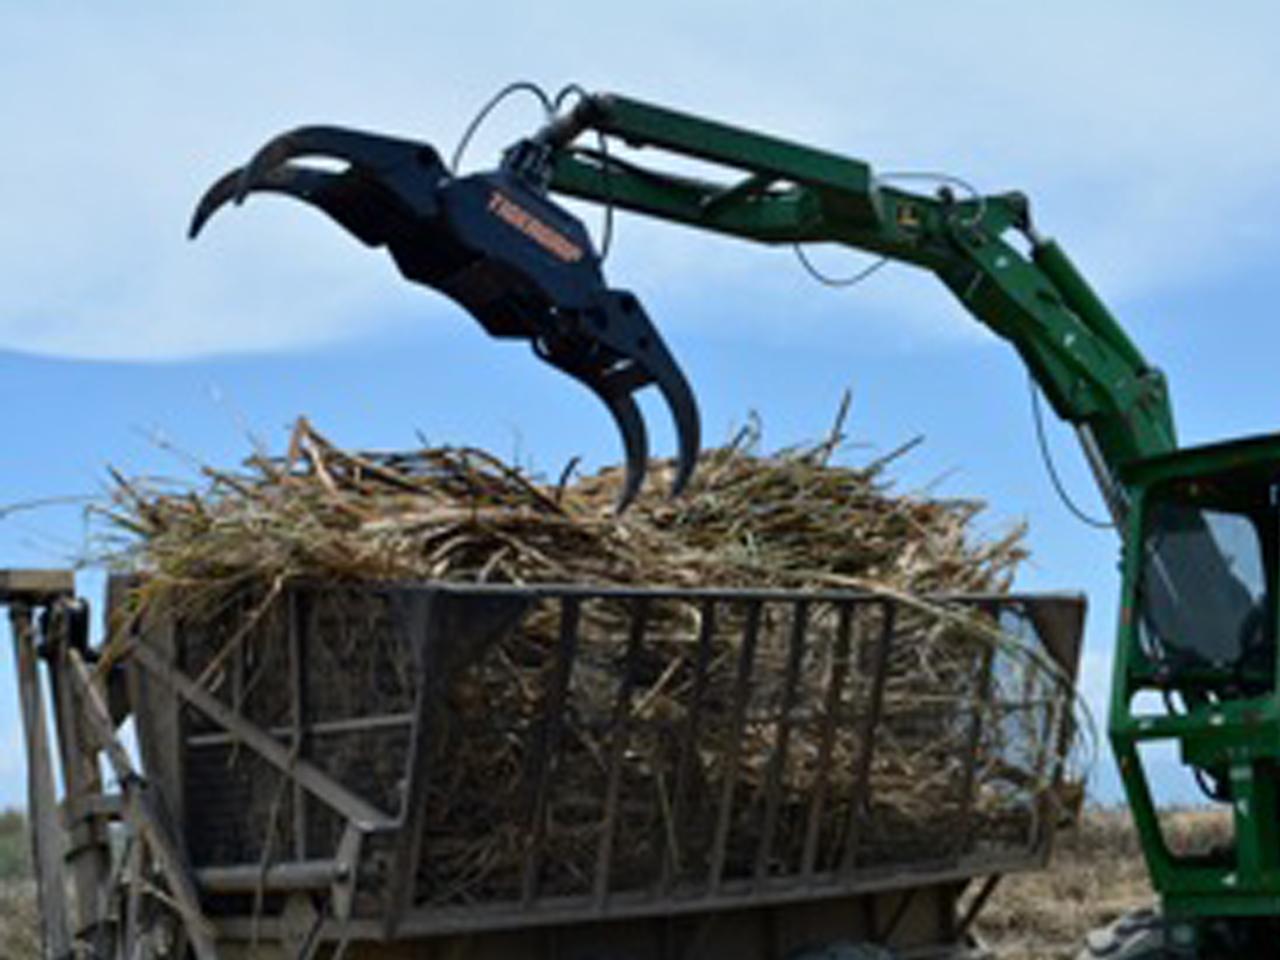 Crane Log Grapples - Crane Log Grapple - Log Grapples - Log